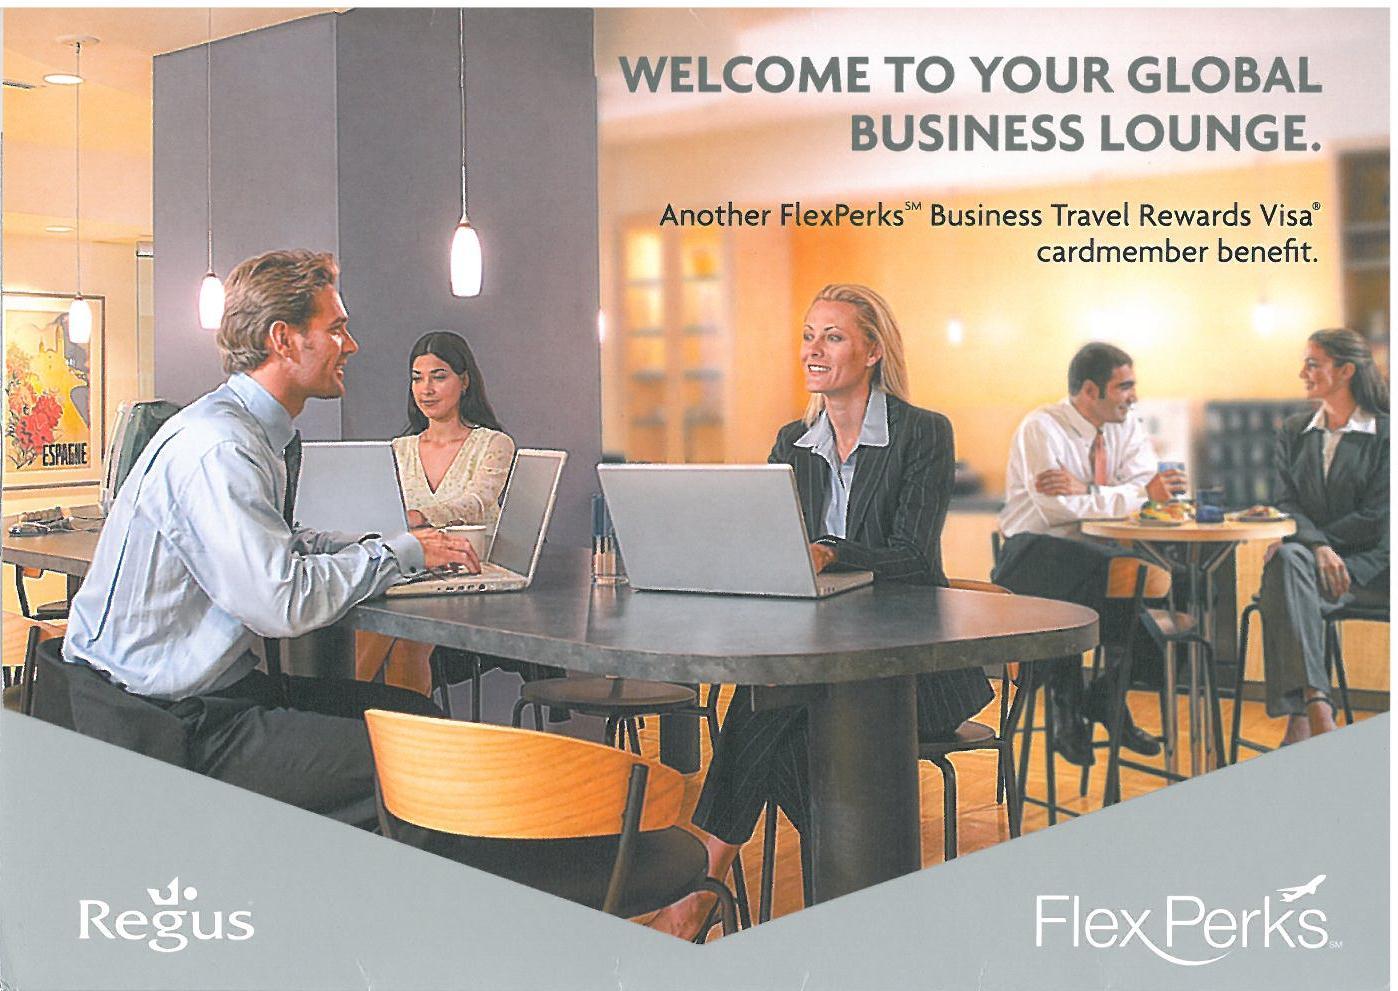 US Bank Flexperks Business Card Offers Lounge Access via